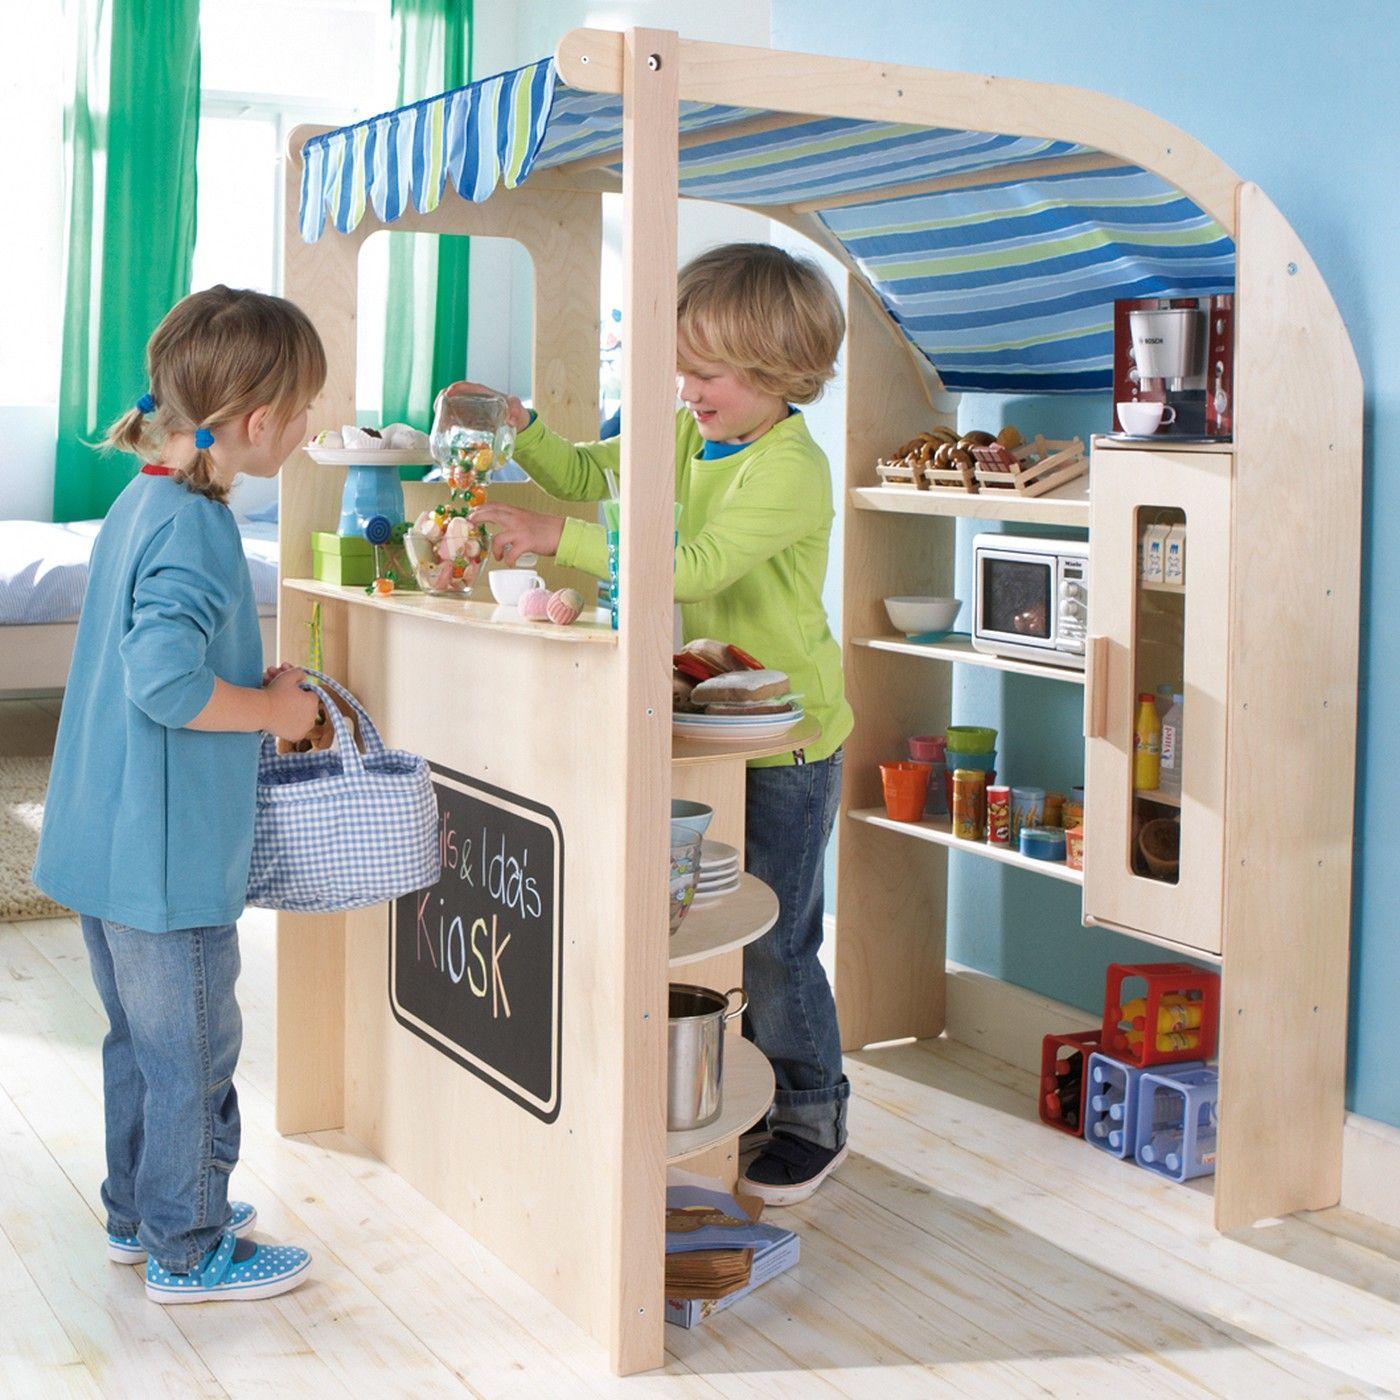 kiosk jako o things for my kids pinterest kaufladen kinderzimmer und wolle kaufen. Black Bedroom Furniture Sets. Home Design Ideas